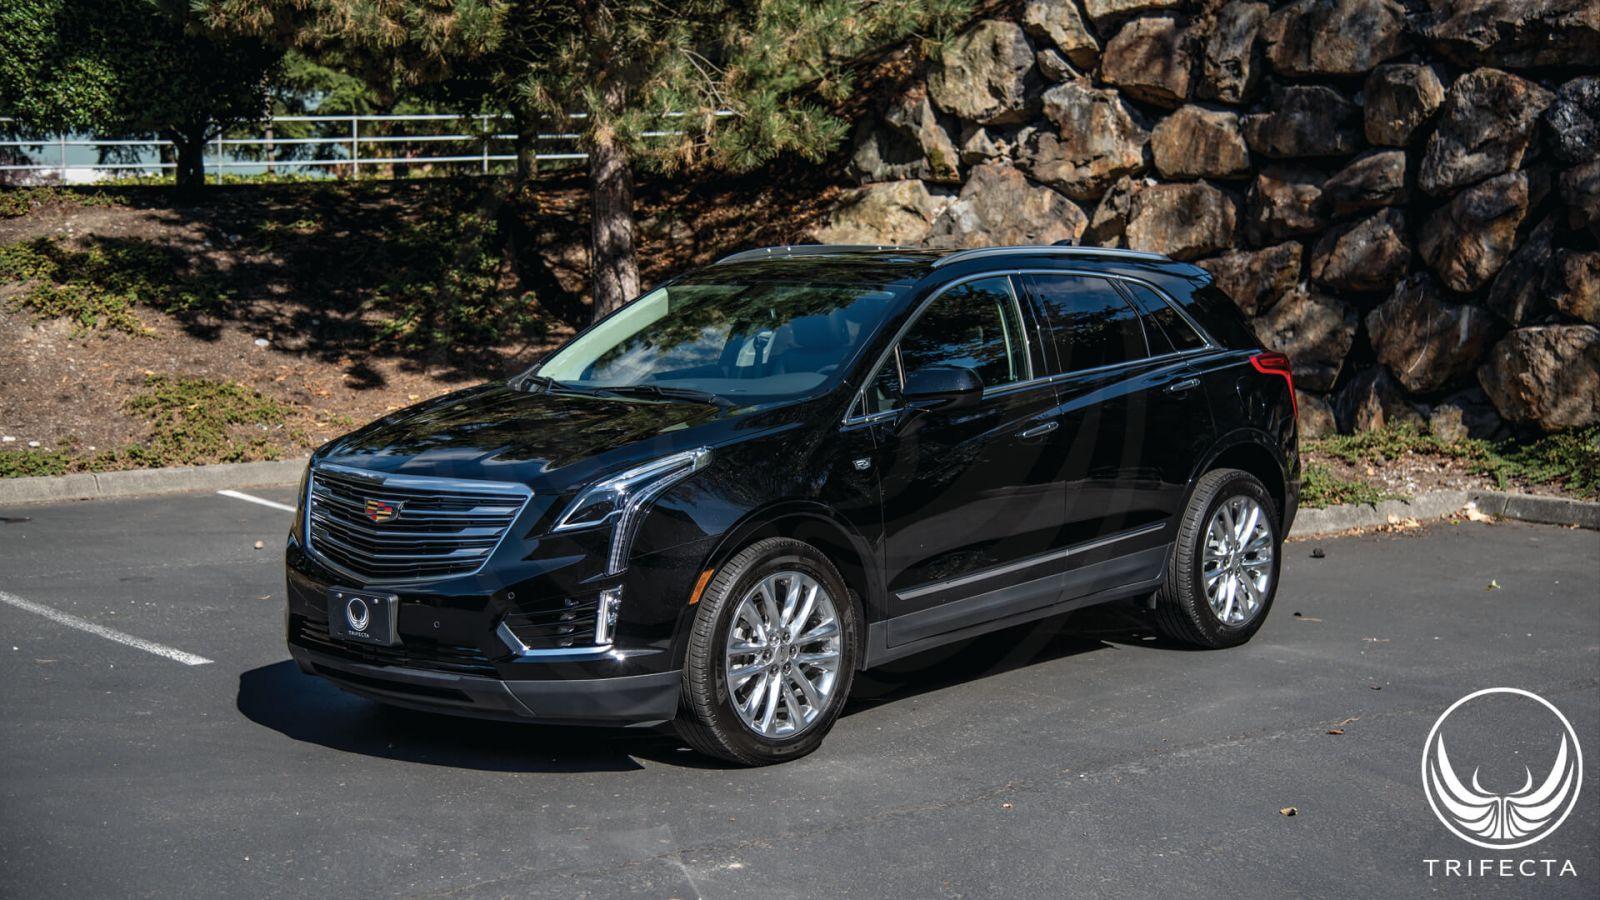 Cadillac Escalade Platinum >> TRIFECTA: For your Cadillac XT5